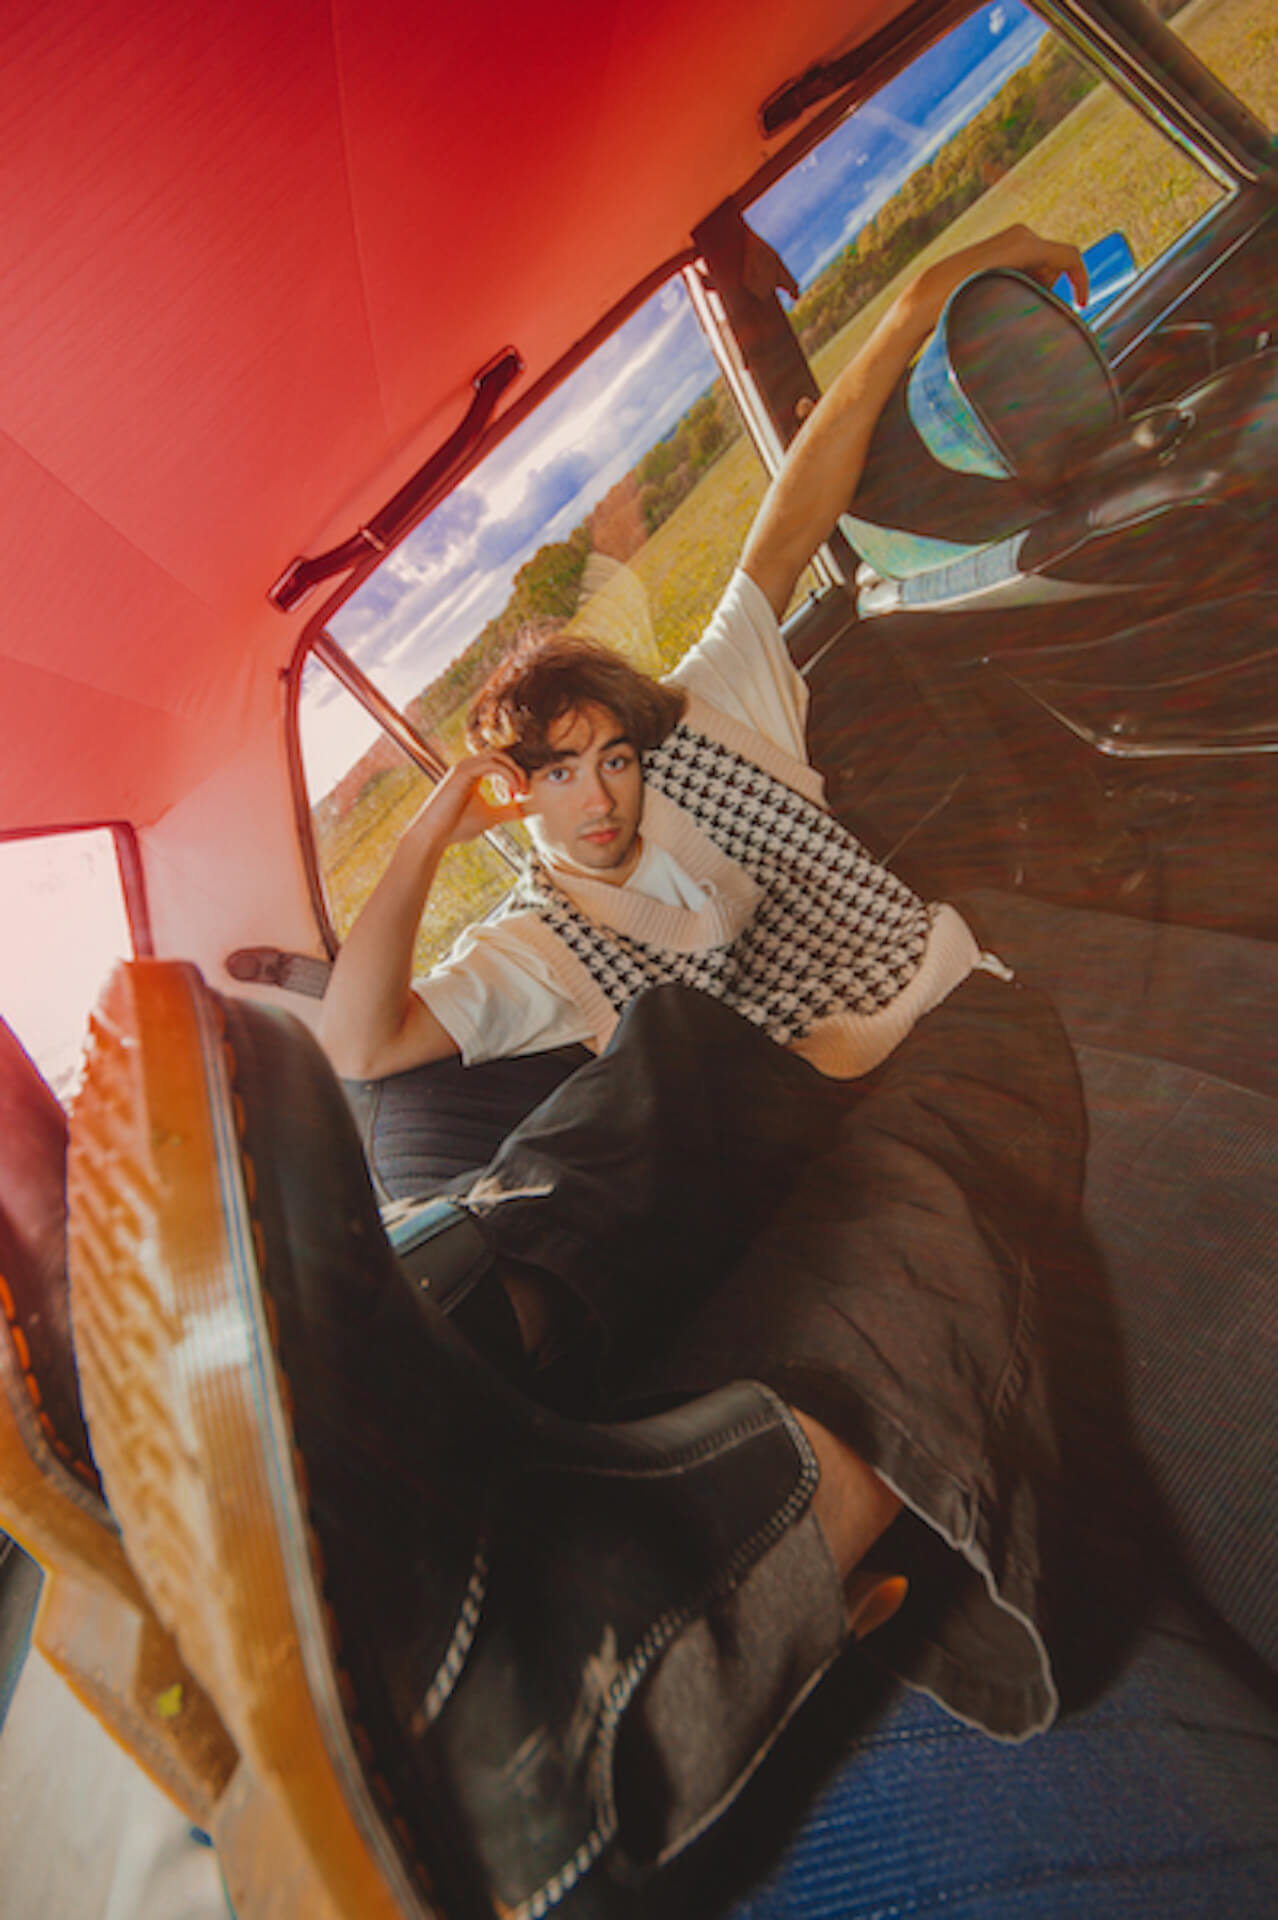 UK出身18歳のSSW・Alfie Templemanが日本の音楽に影響を受けたミニアルバムをリリース!MVも公開 music210510_alfie-empleman-210510_2